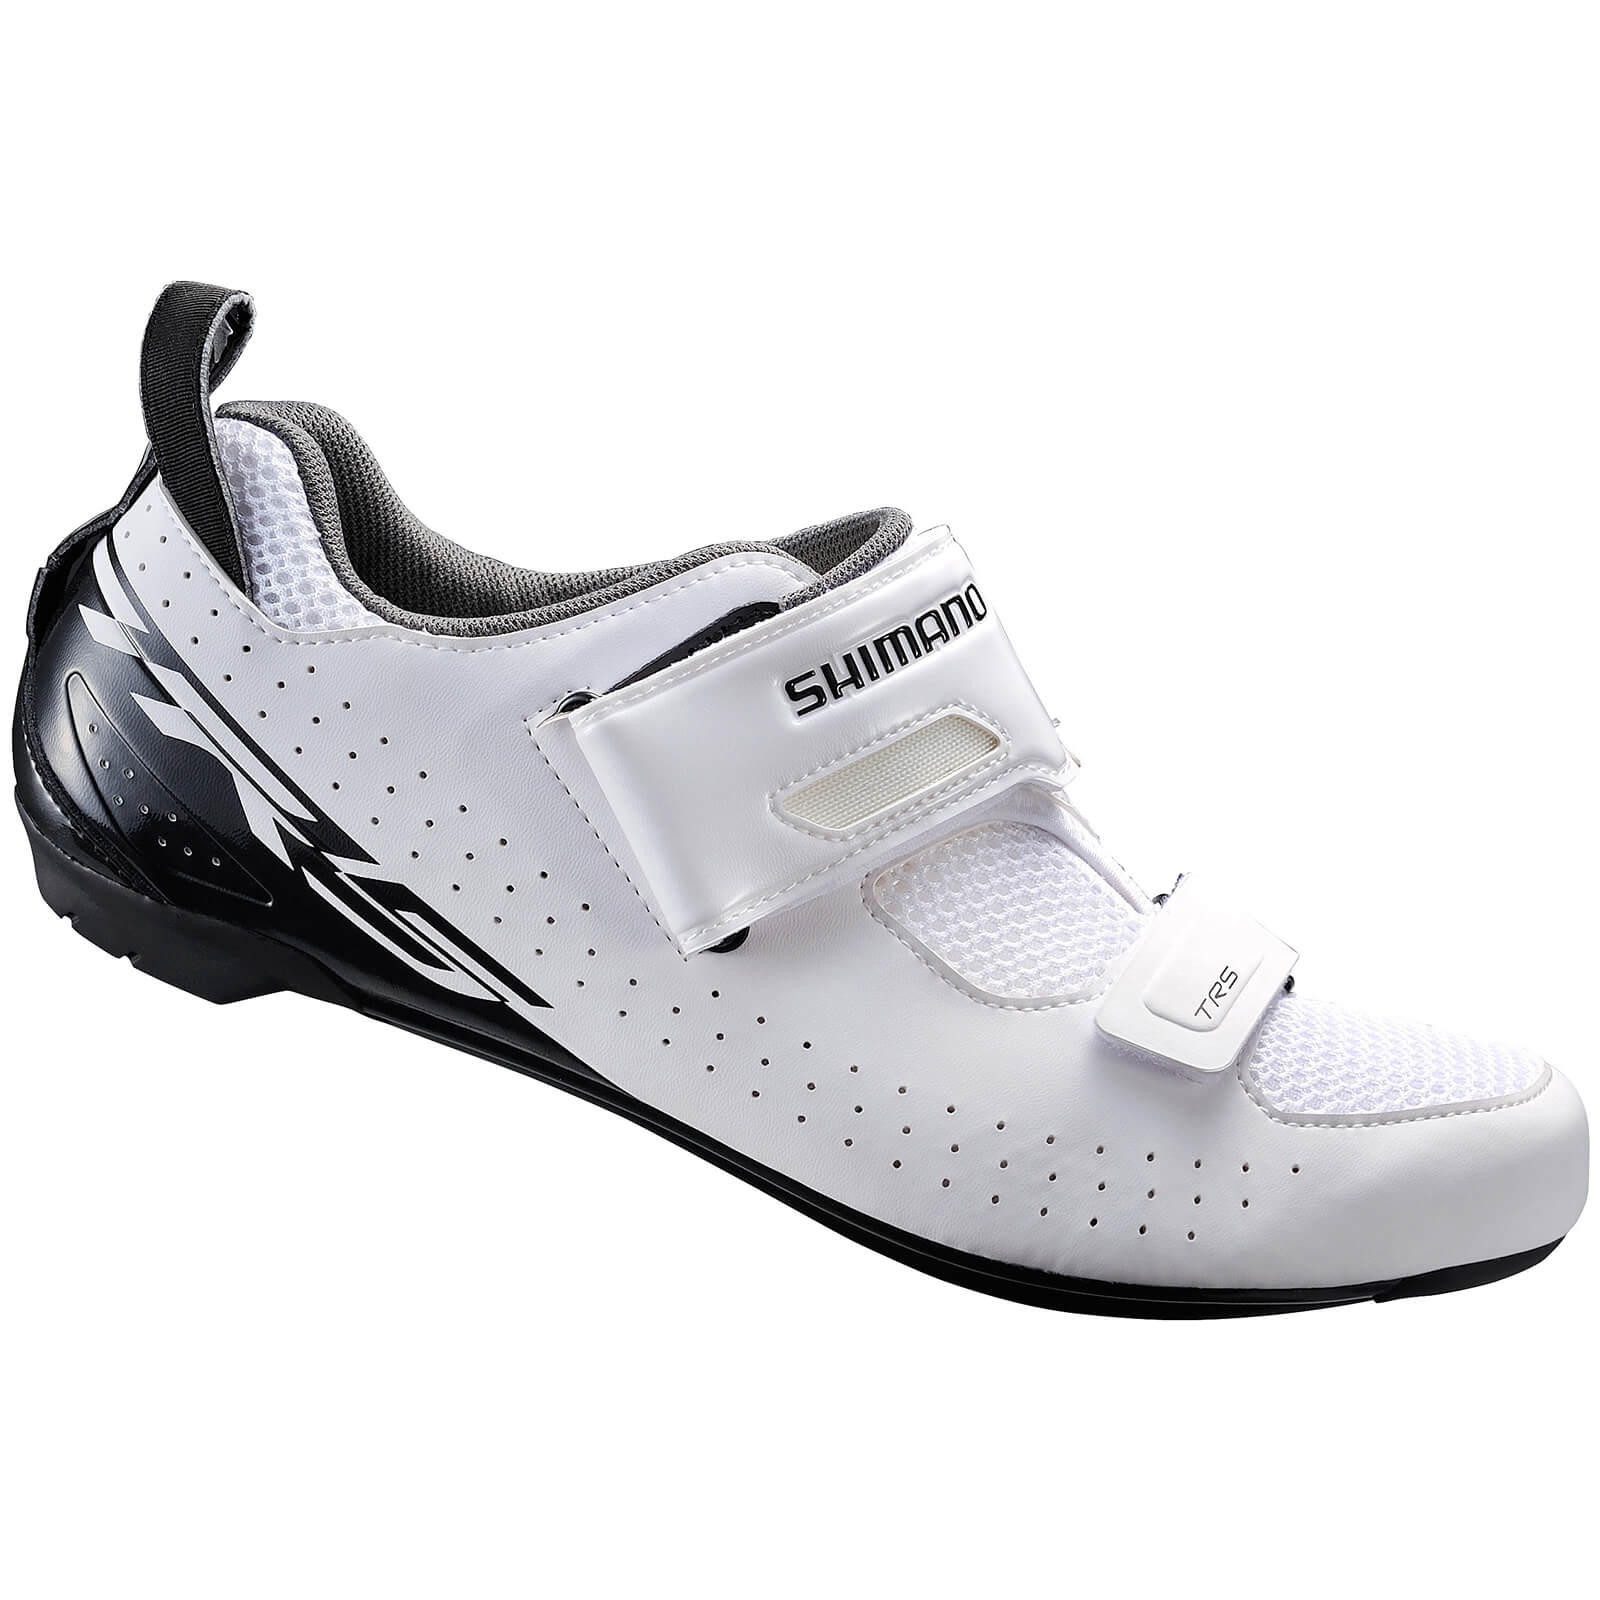 Shimano TR5 SPD-SL Triathlon Shoes - White - EU 39 - White